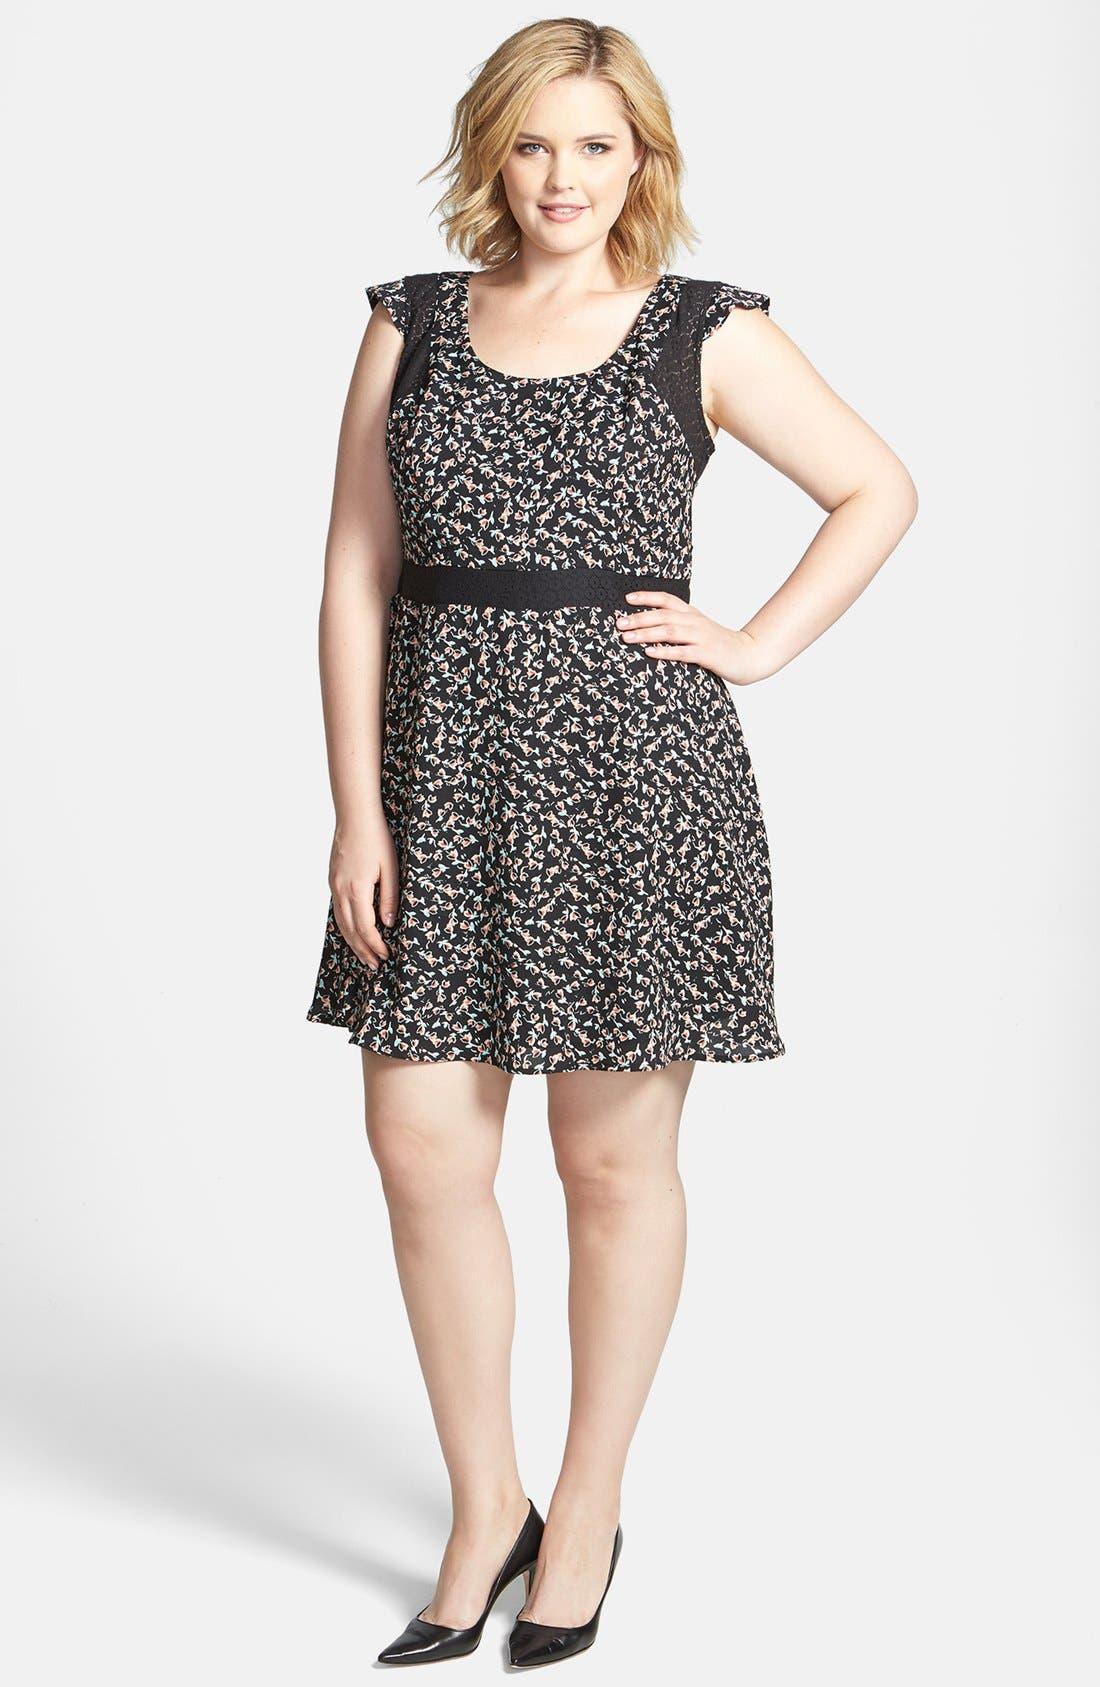 Main Image - Jessica Simpson 'Dupree' Fit & Flare Dress (Plus Size)